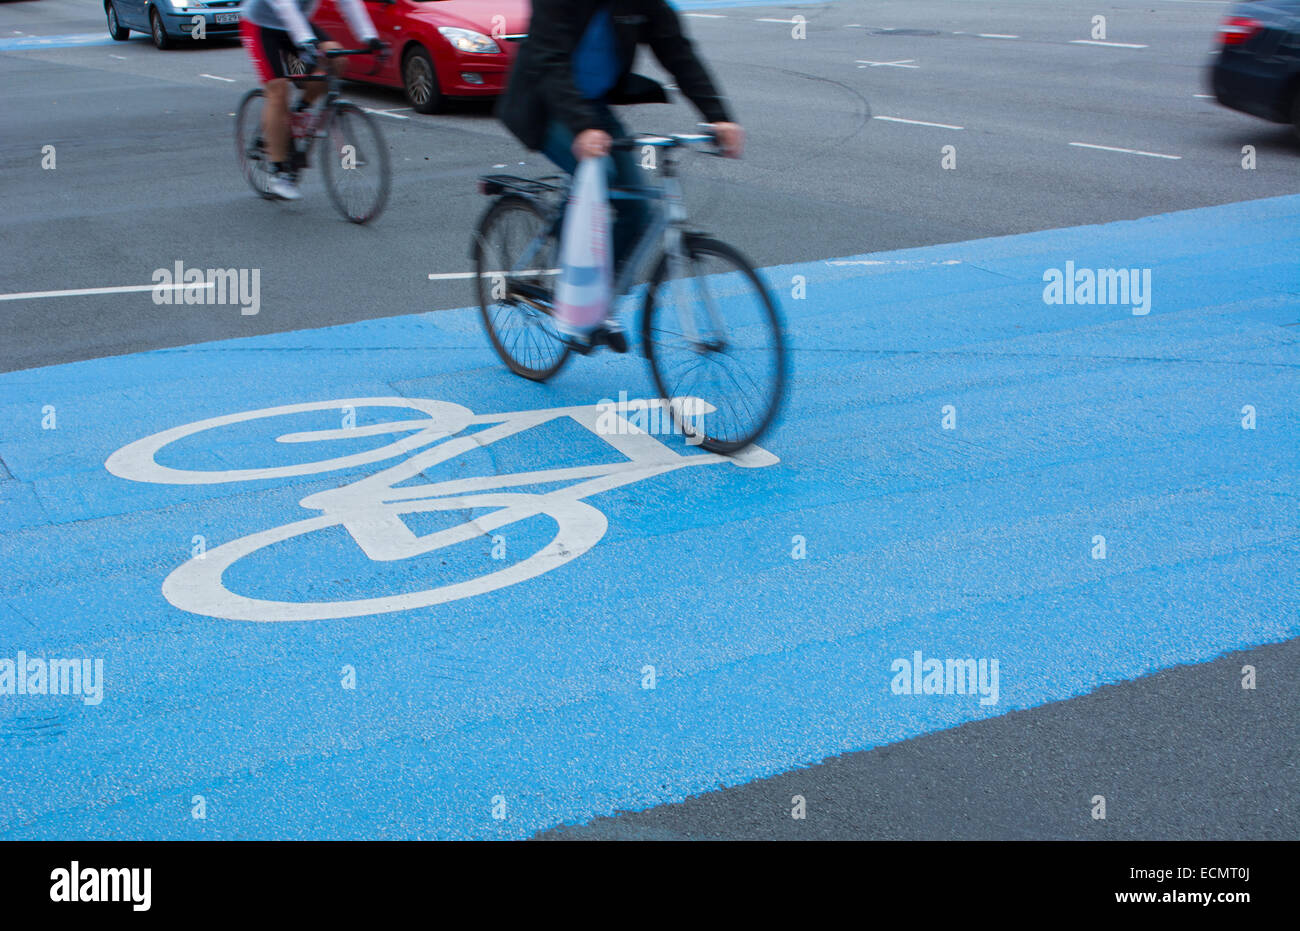 Copenhagen Denmark bicycles riding in restricted bike lanes on H.C. Andersens Blvd in downtown Kobenhavn - Stock Image